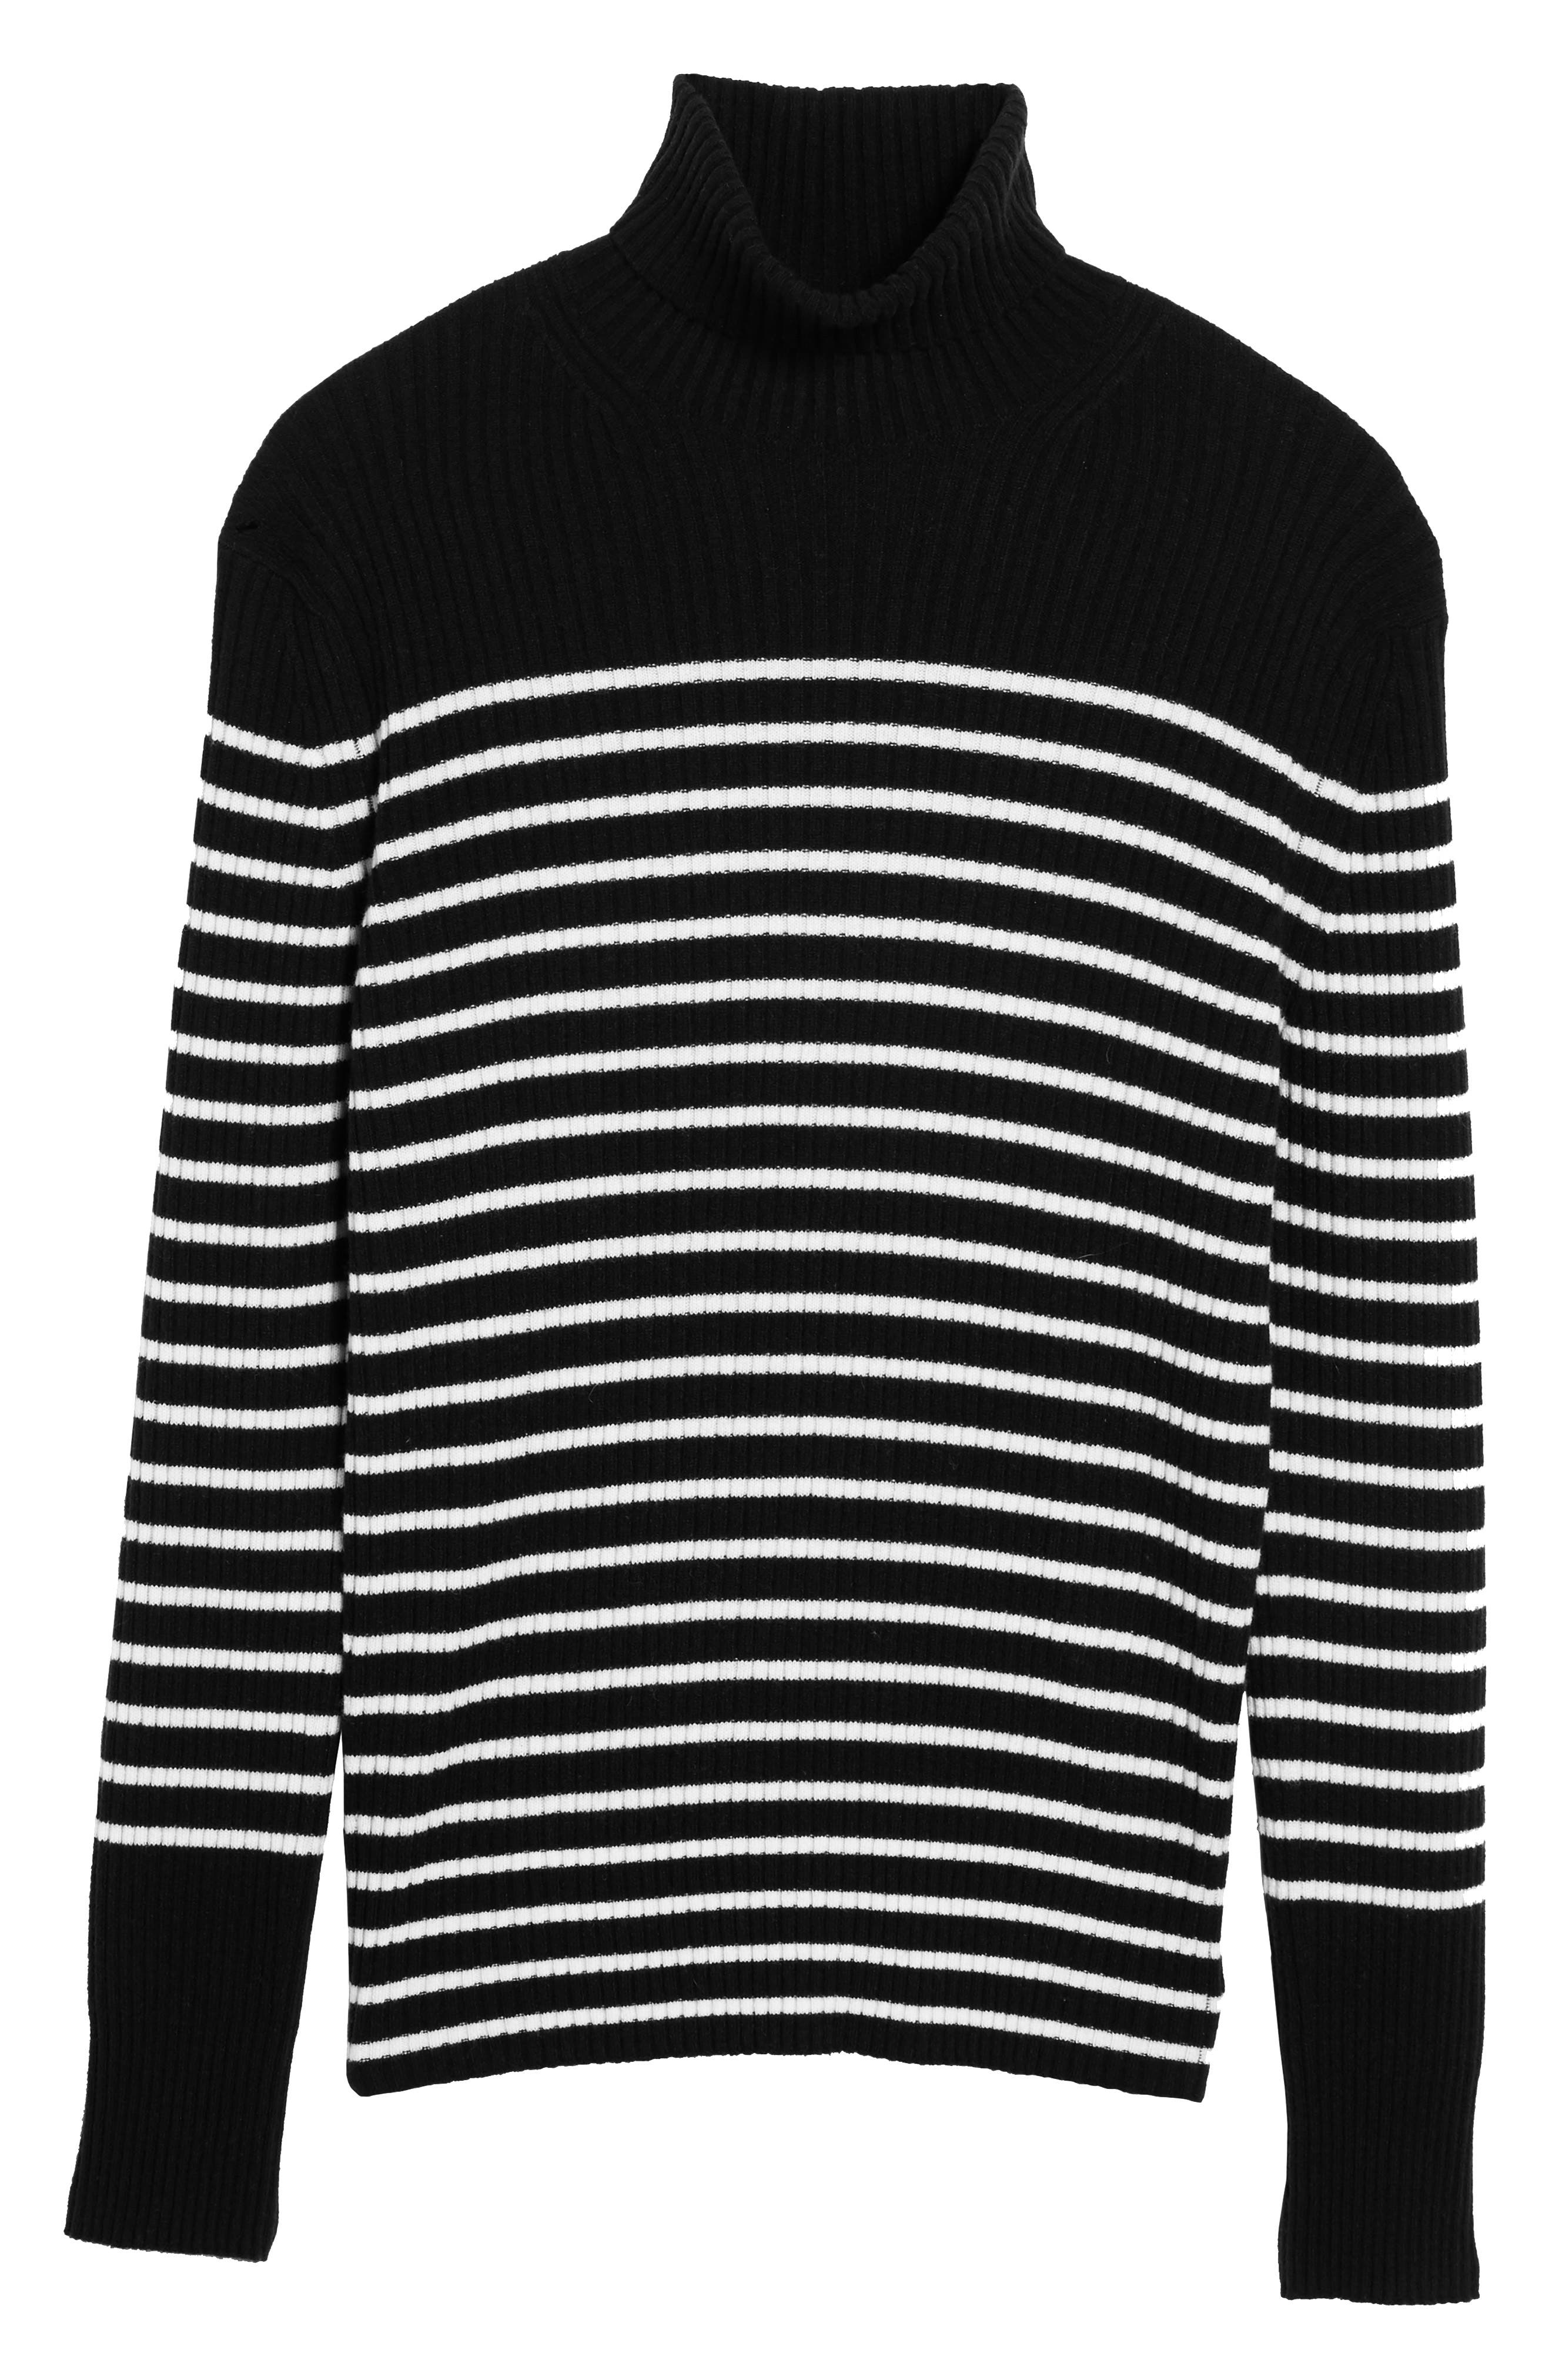 Regular Fit Breton Stripe Cashmere Turtleneck Sweater,                             Alternate thumbnail 5, color,                             Coastal/ Breeze